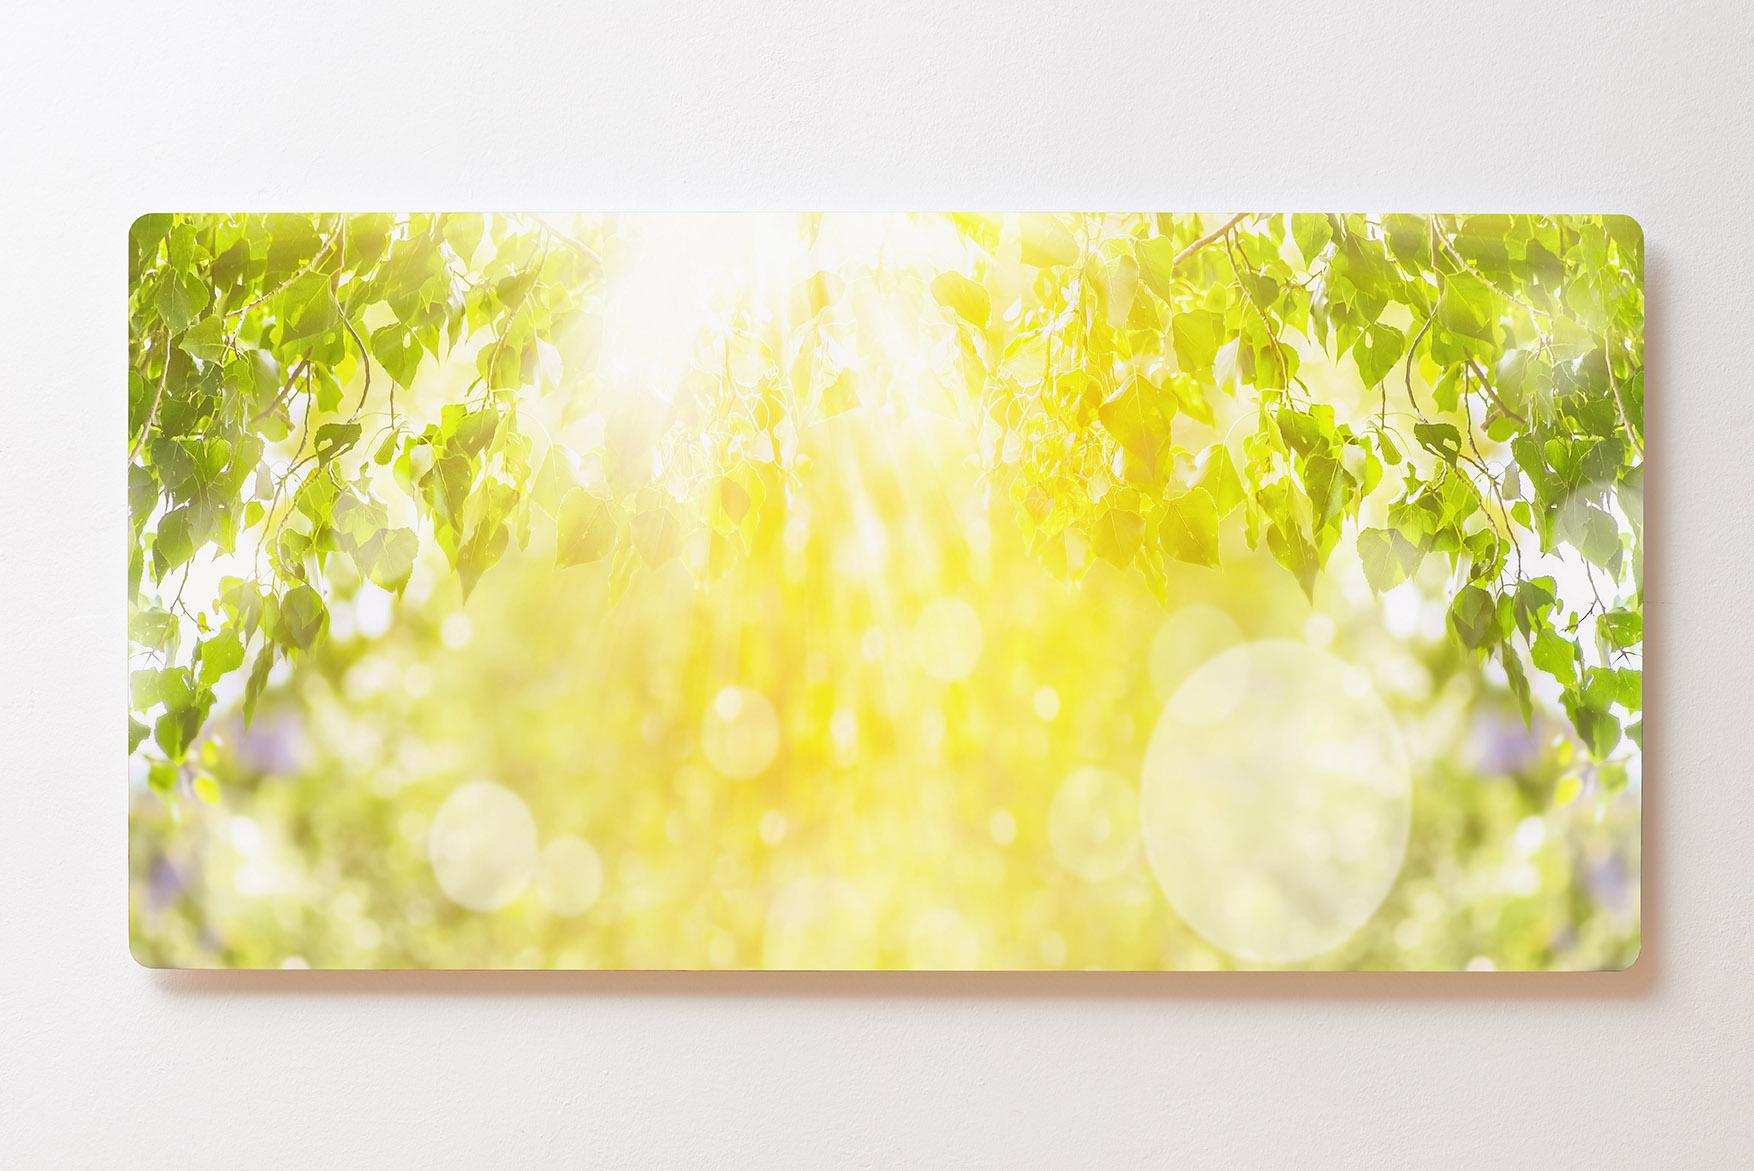 Magnettafel BACKLIGHT 120x60cm Motiv-Wandbild M113 Sonnenuntergang Bäume